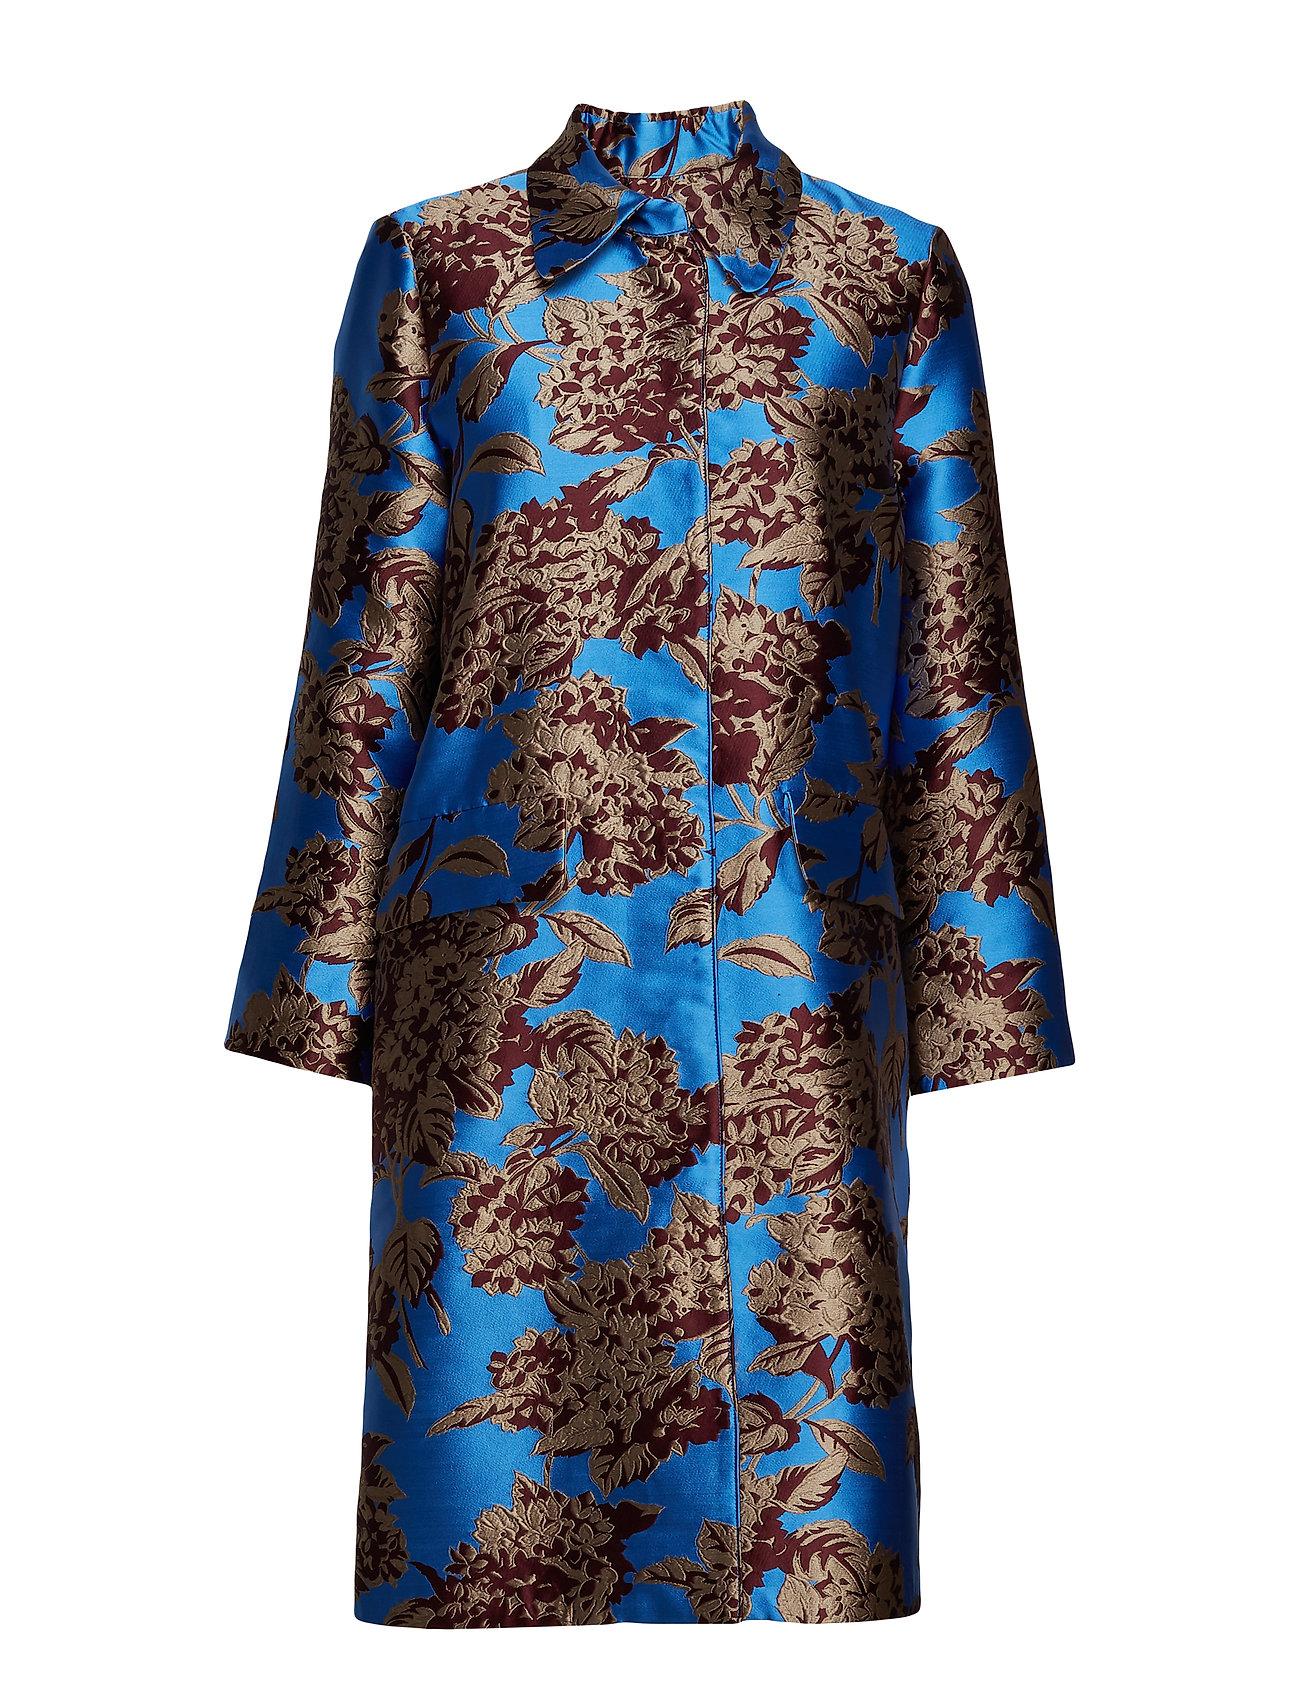 Lovechild 1979 Perrine coat - FRENCH BLUE